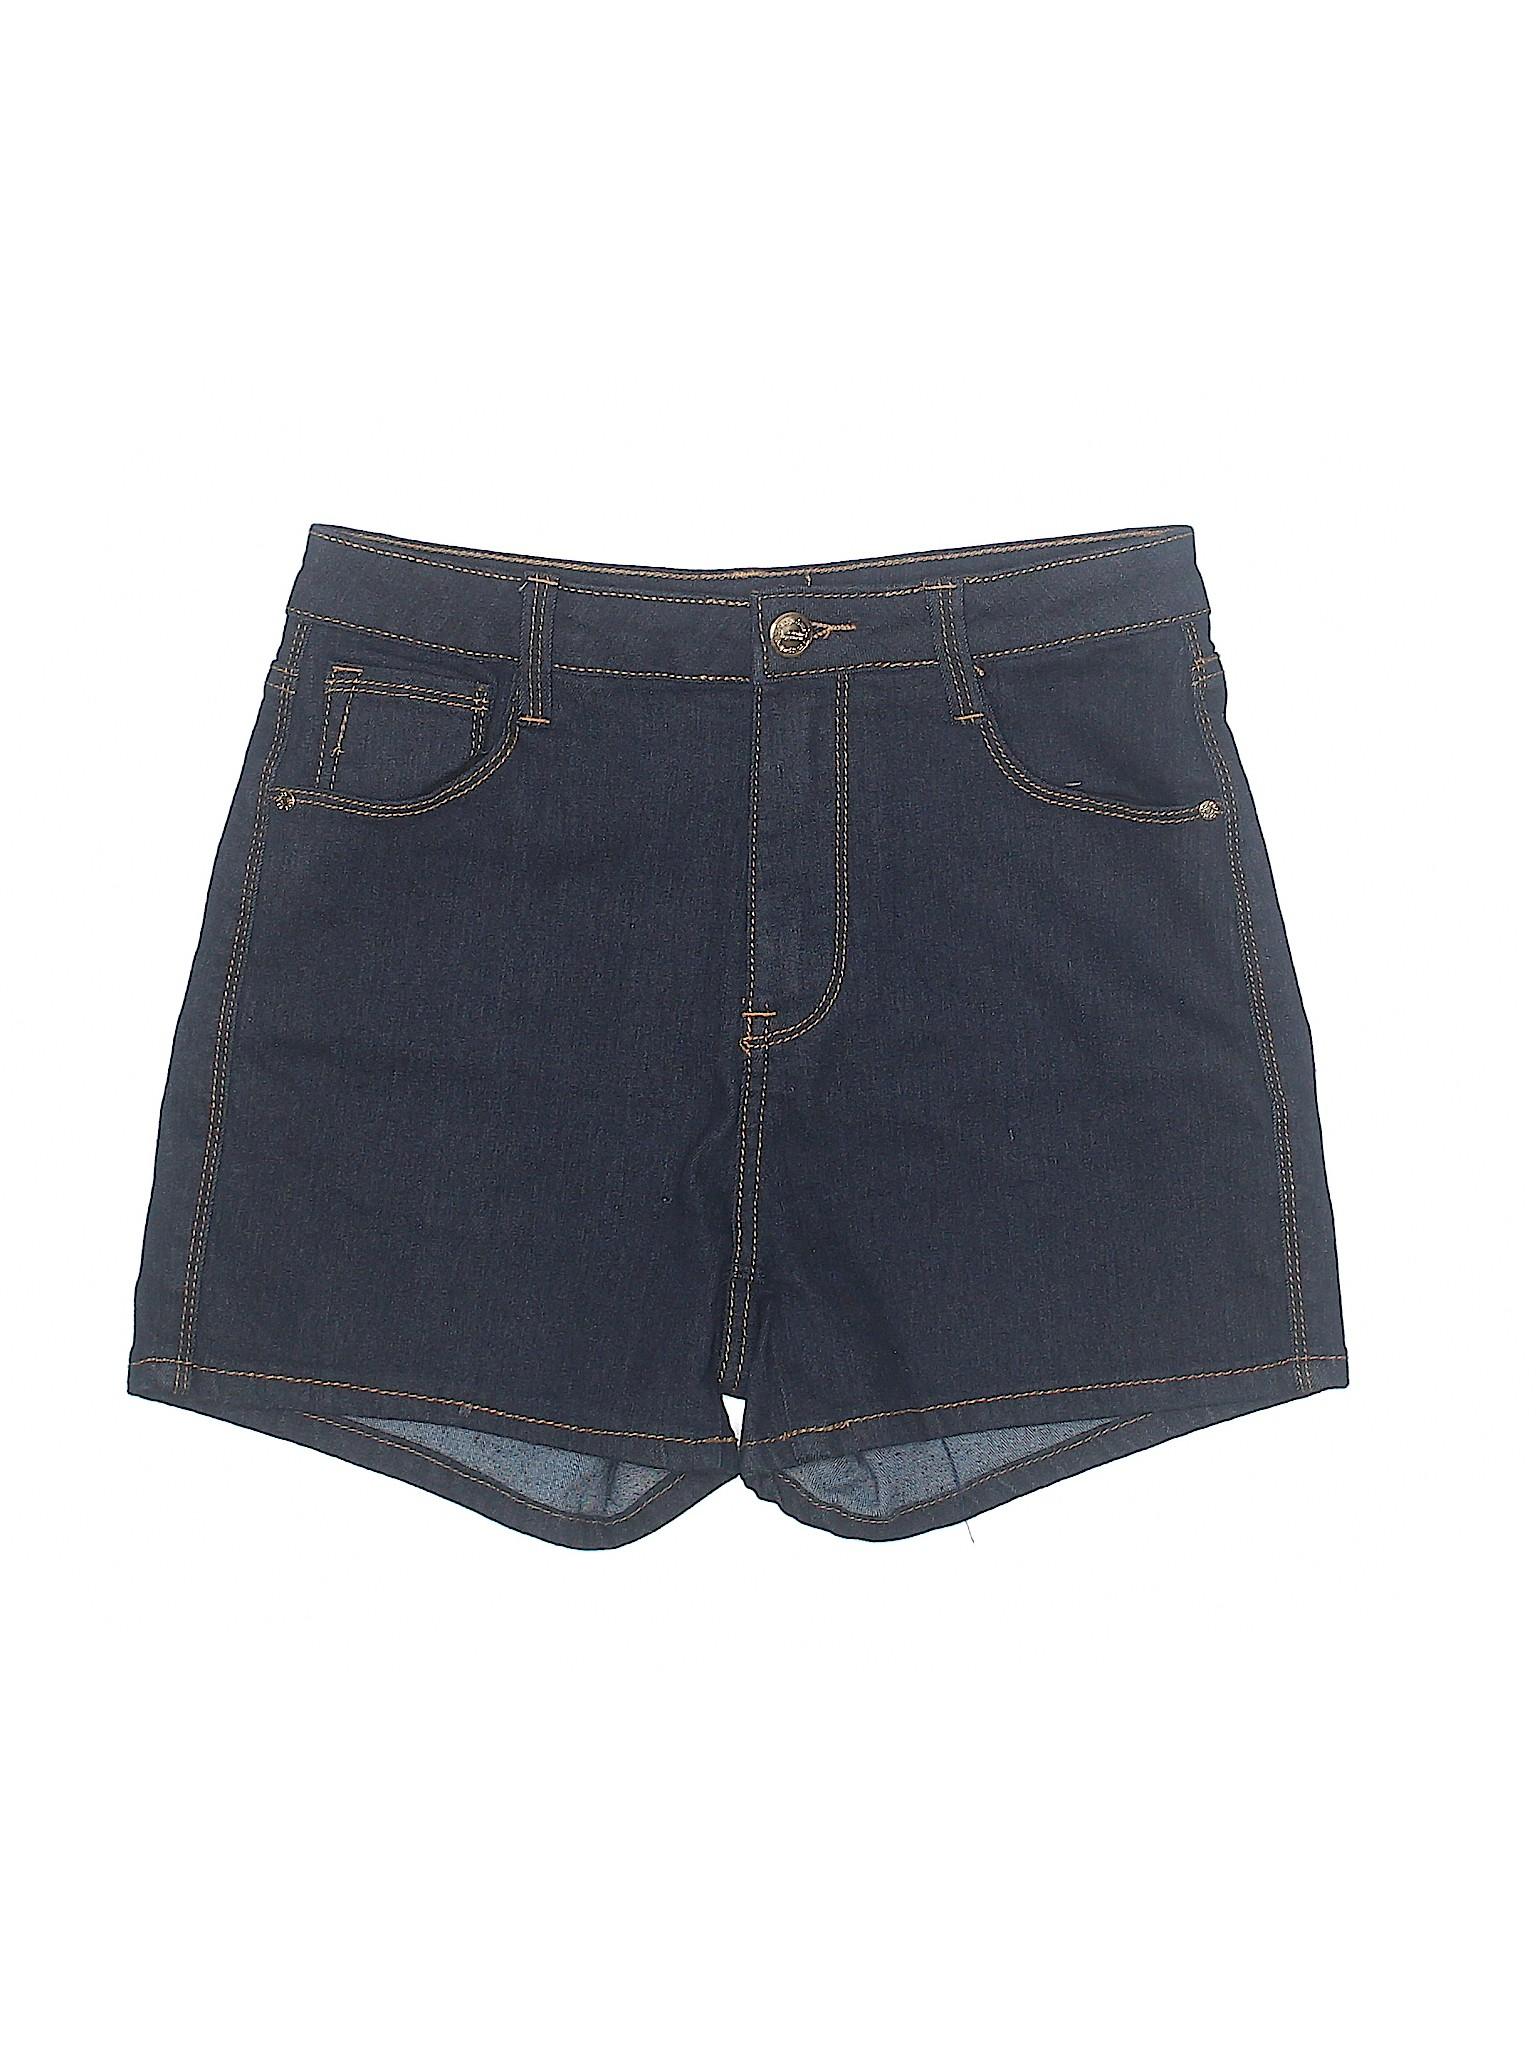 Boutique winter Papaya Shorts Denim Shorts Denim Papaya Boutique Boutique Papaya Shorts winter Denim winter fd1wqd6